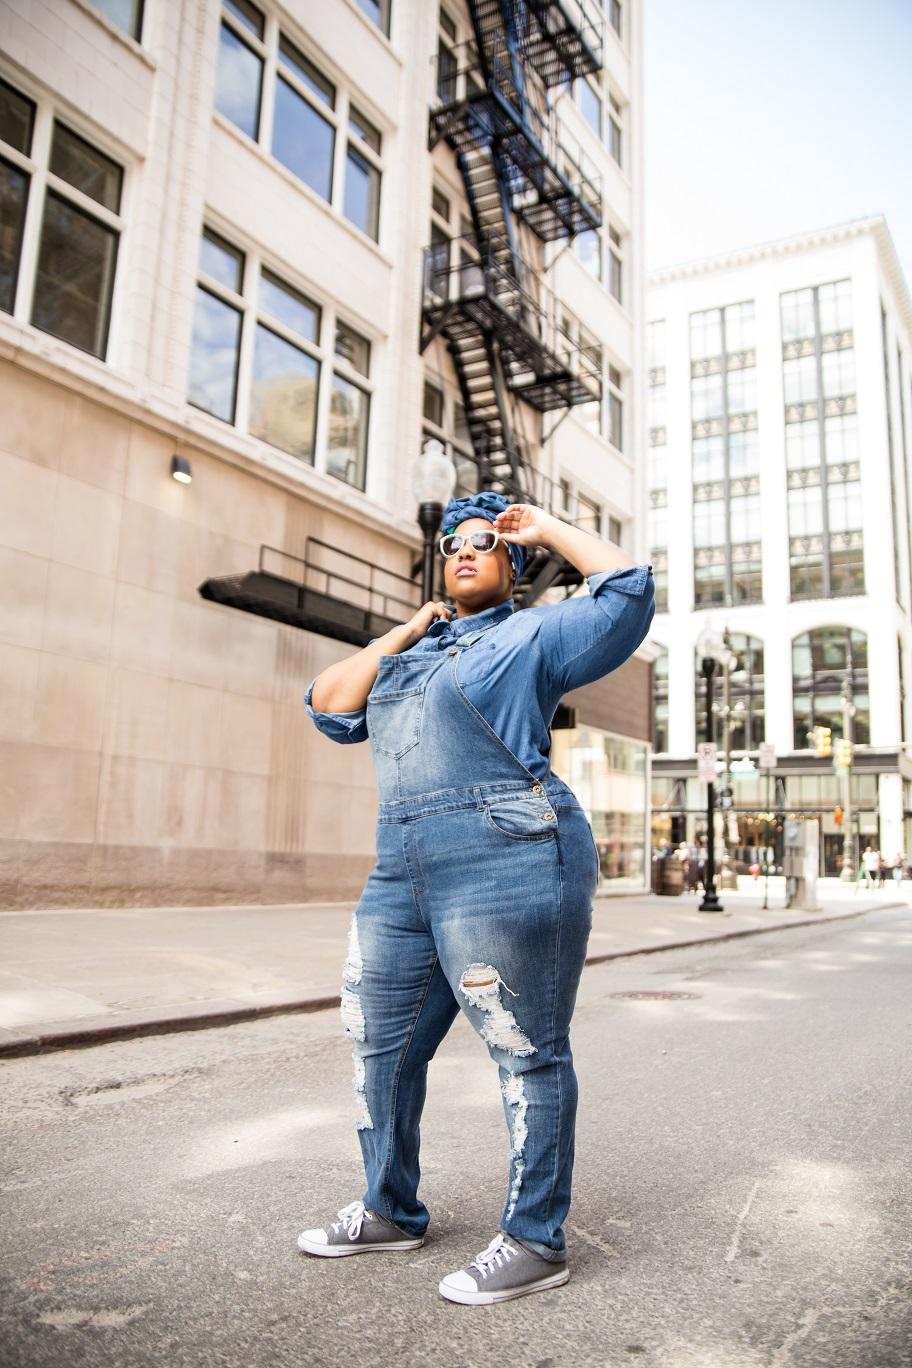 Leah-Vernon-Plus-Size-Model-Detroit-Blogger-Muslim-Girl-Body-positive